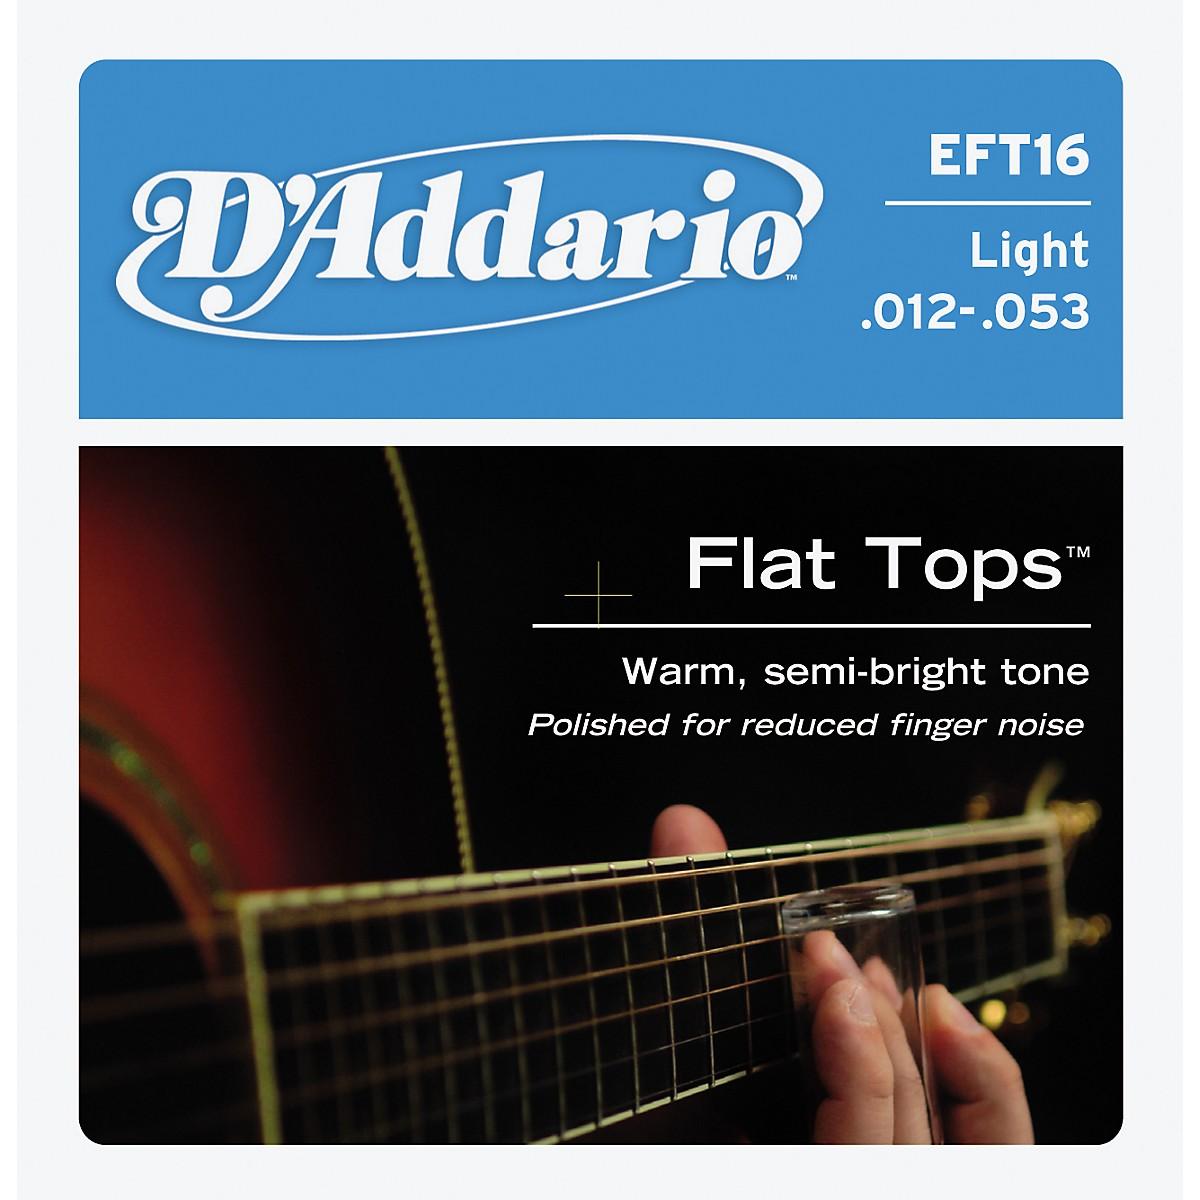 D'Addario EFT16 Flat Top PB Light Acoustic Guitar Strings